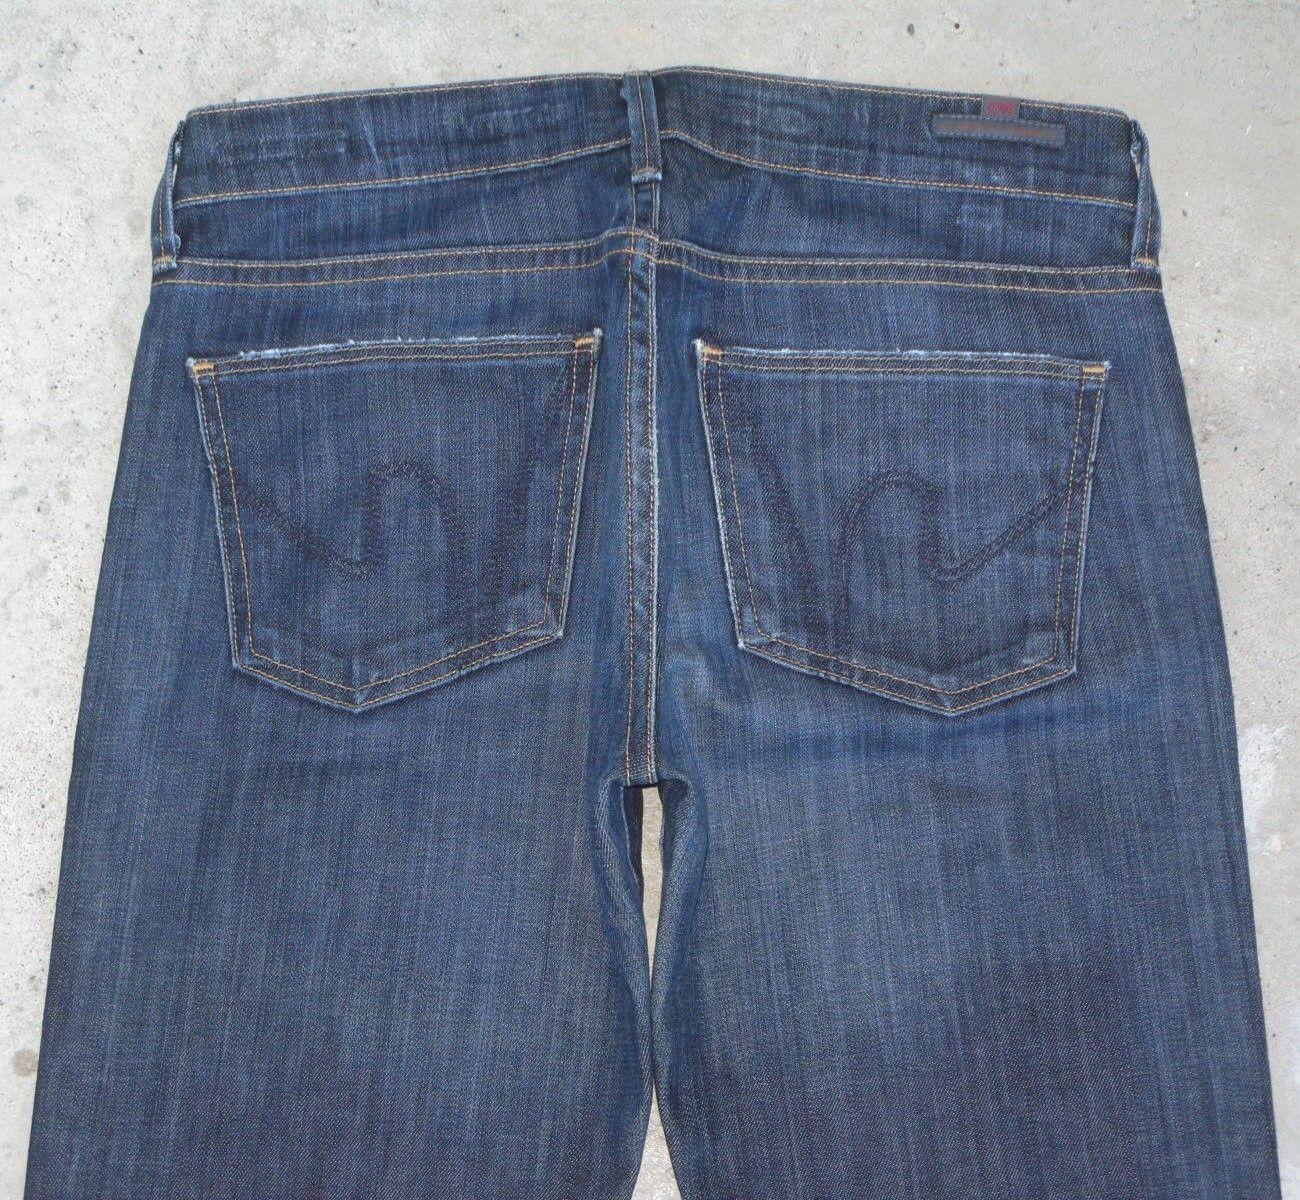 Citizens of Humanity Jeans Dita Petite Bootcut Sz 26 Dark Distressed Stretch